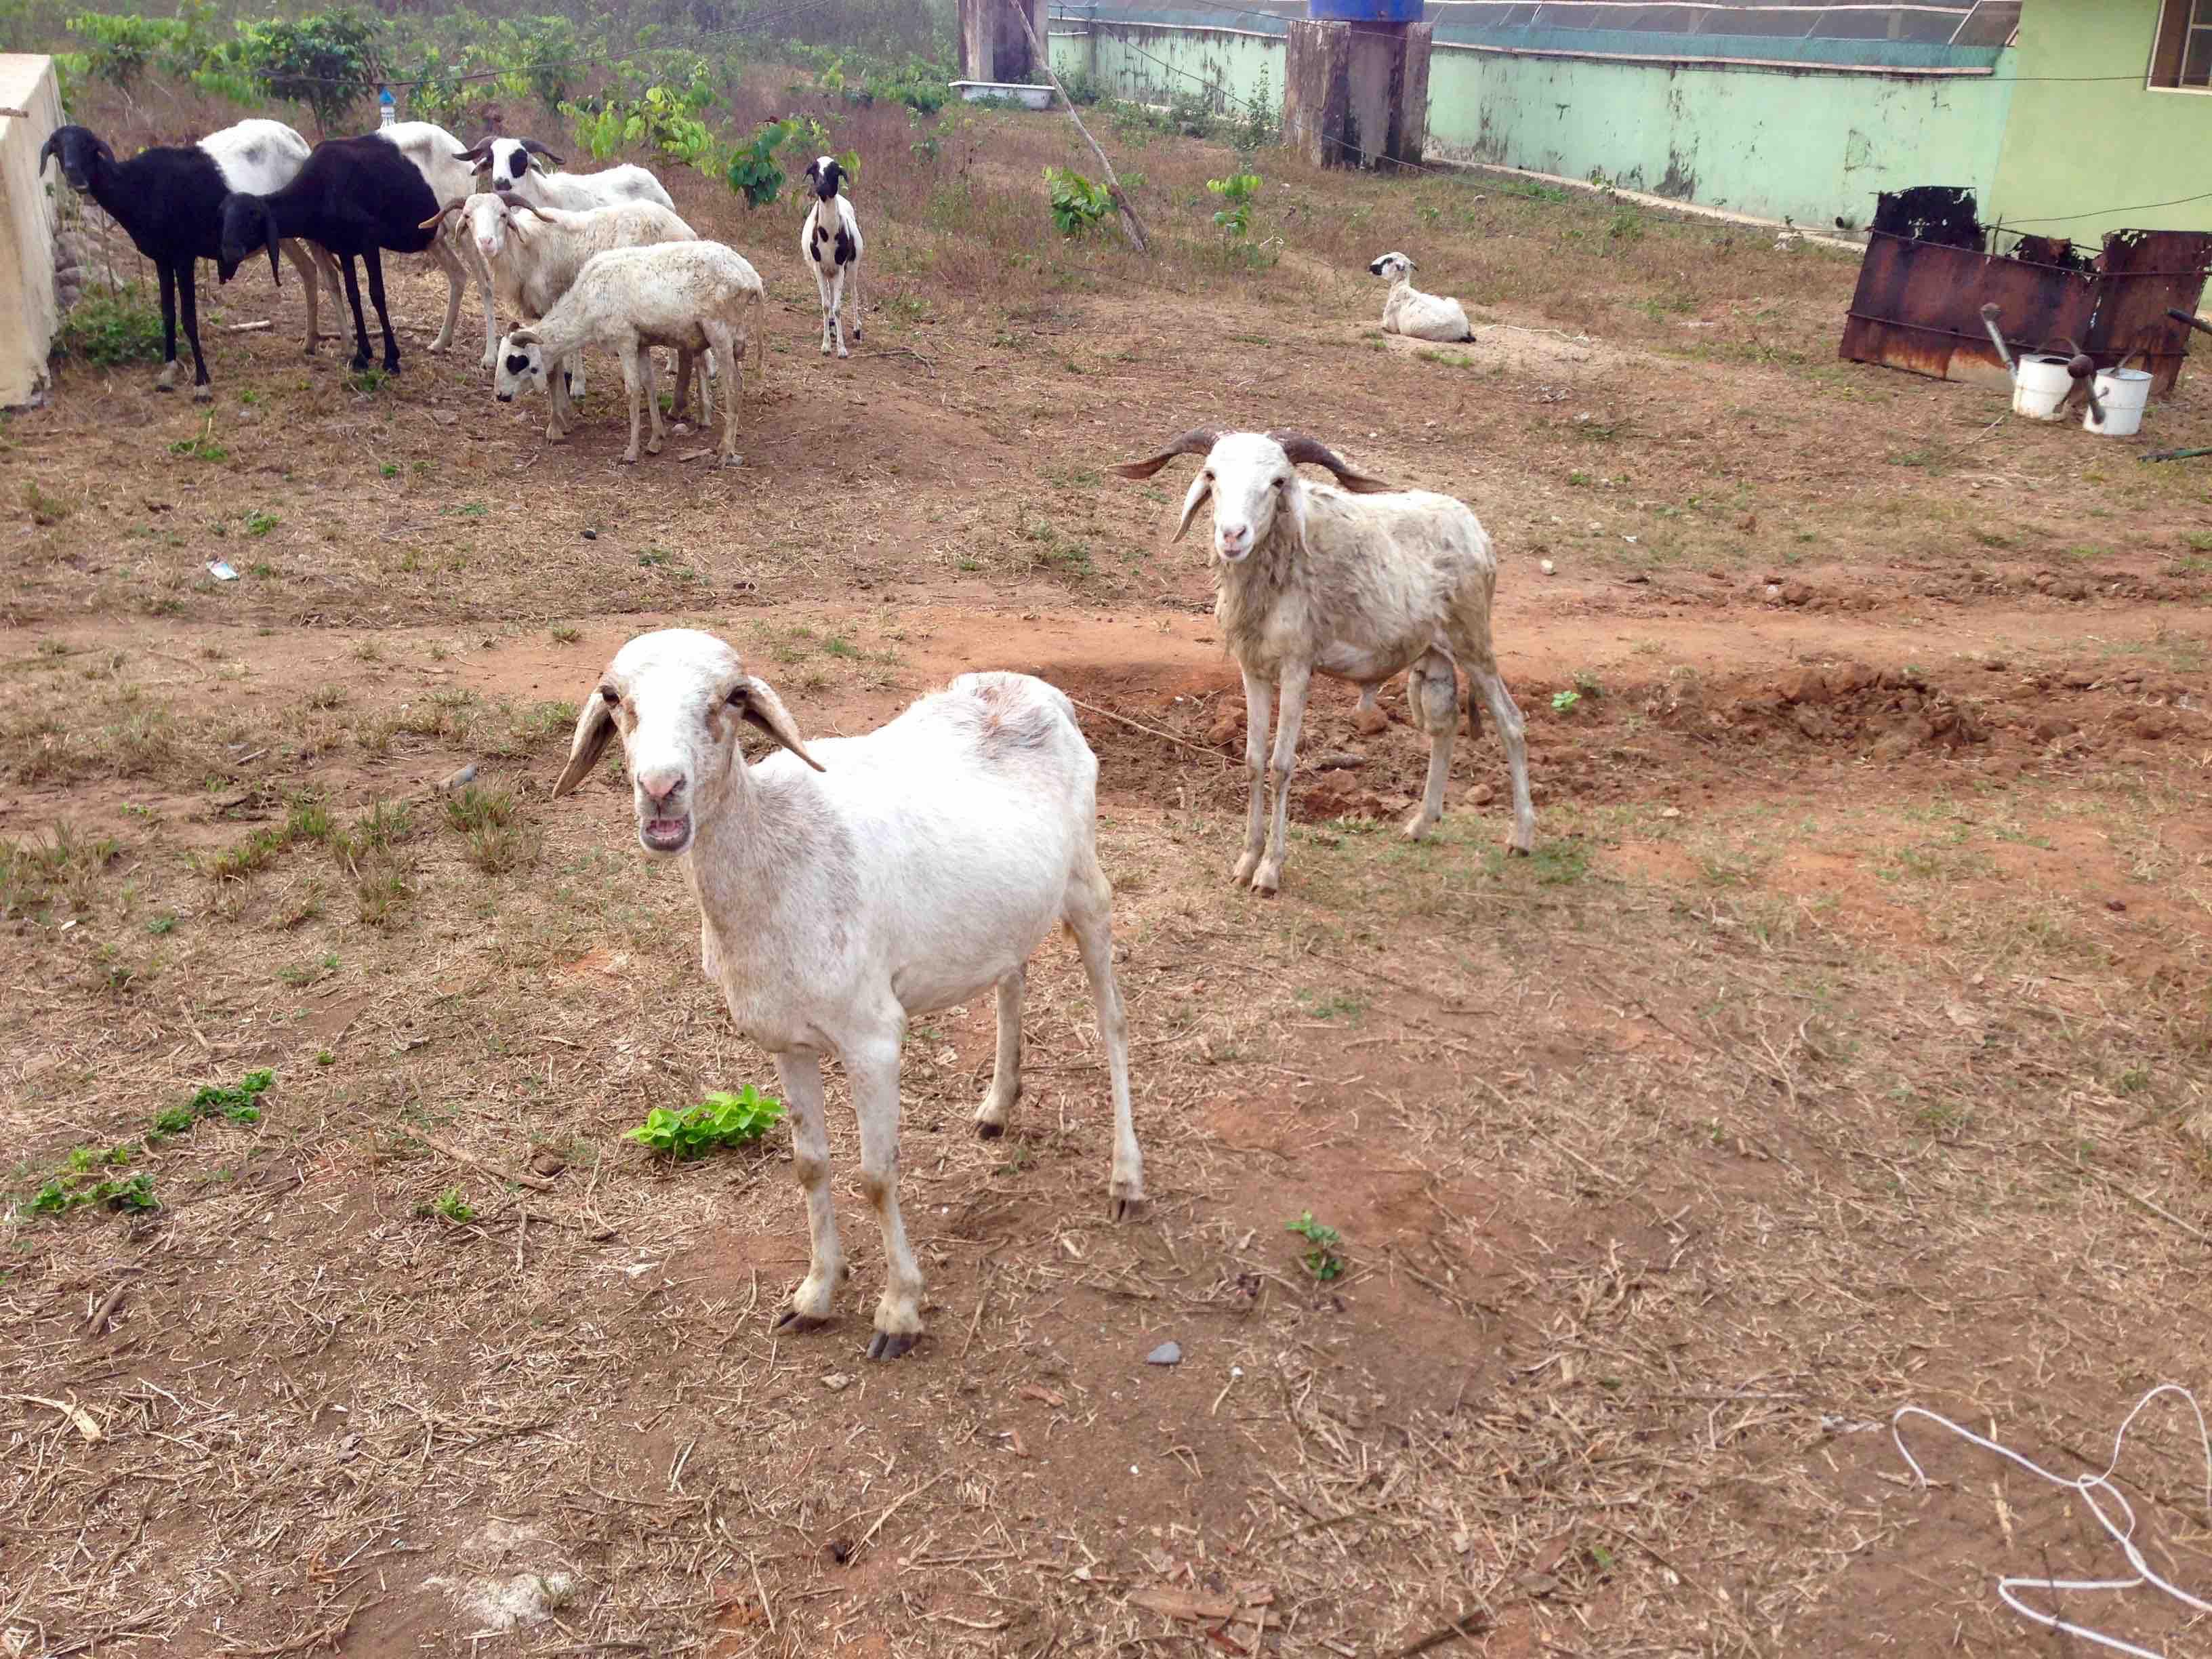 Sheep, Otedola Integrated Farms, Odoragunshin, Epe, Lagos, Nigeria. #JujuFilms